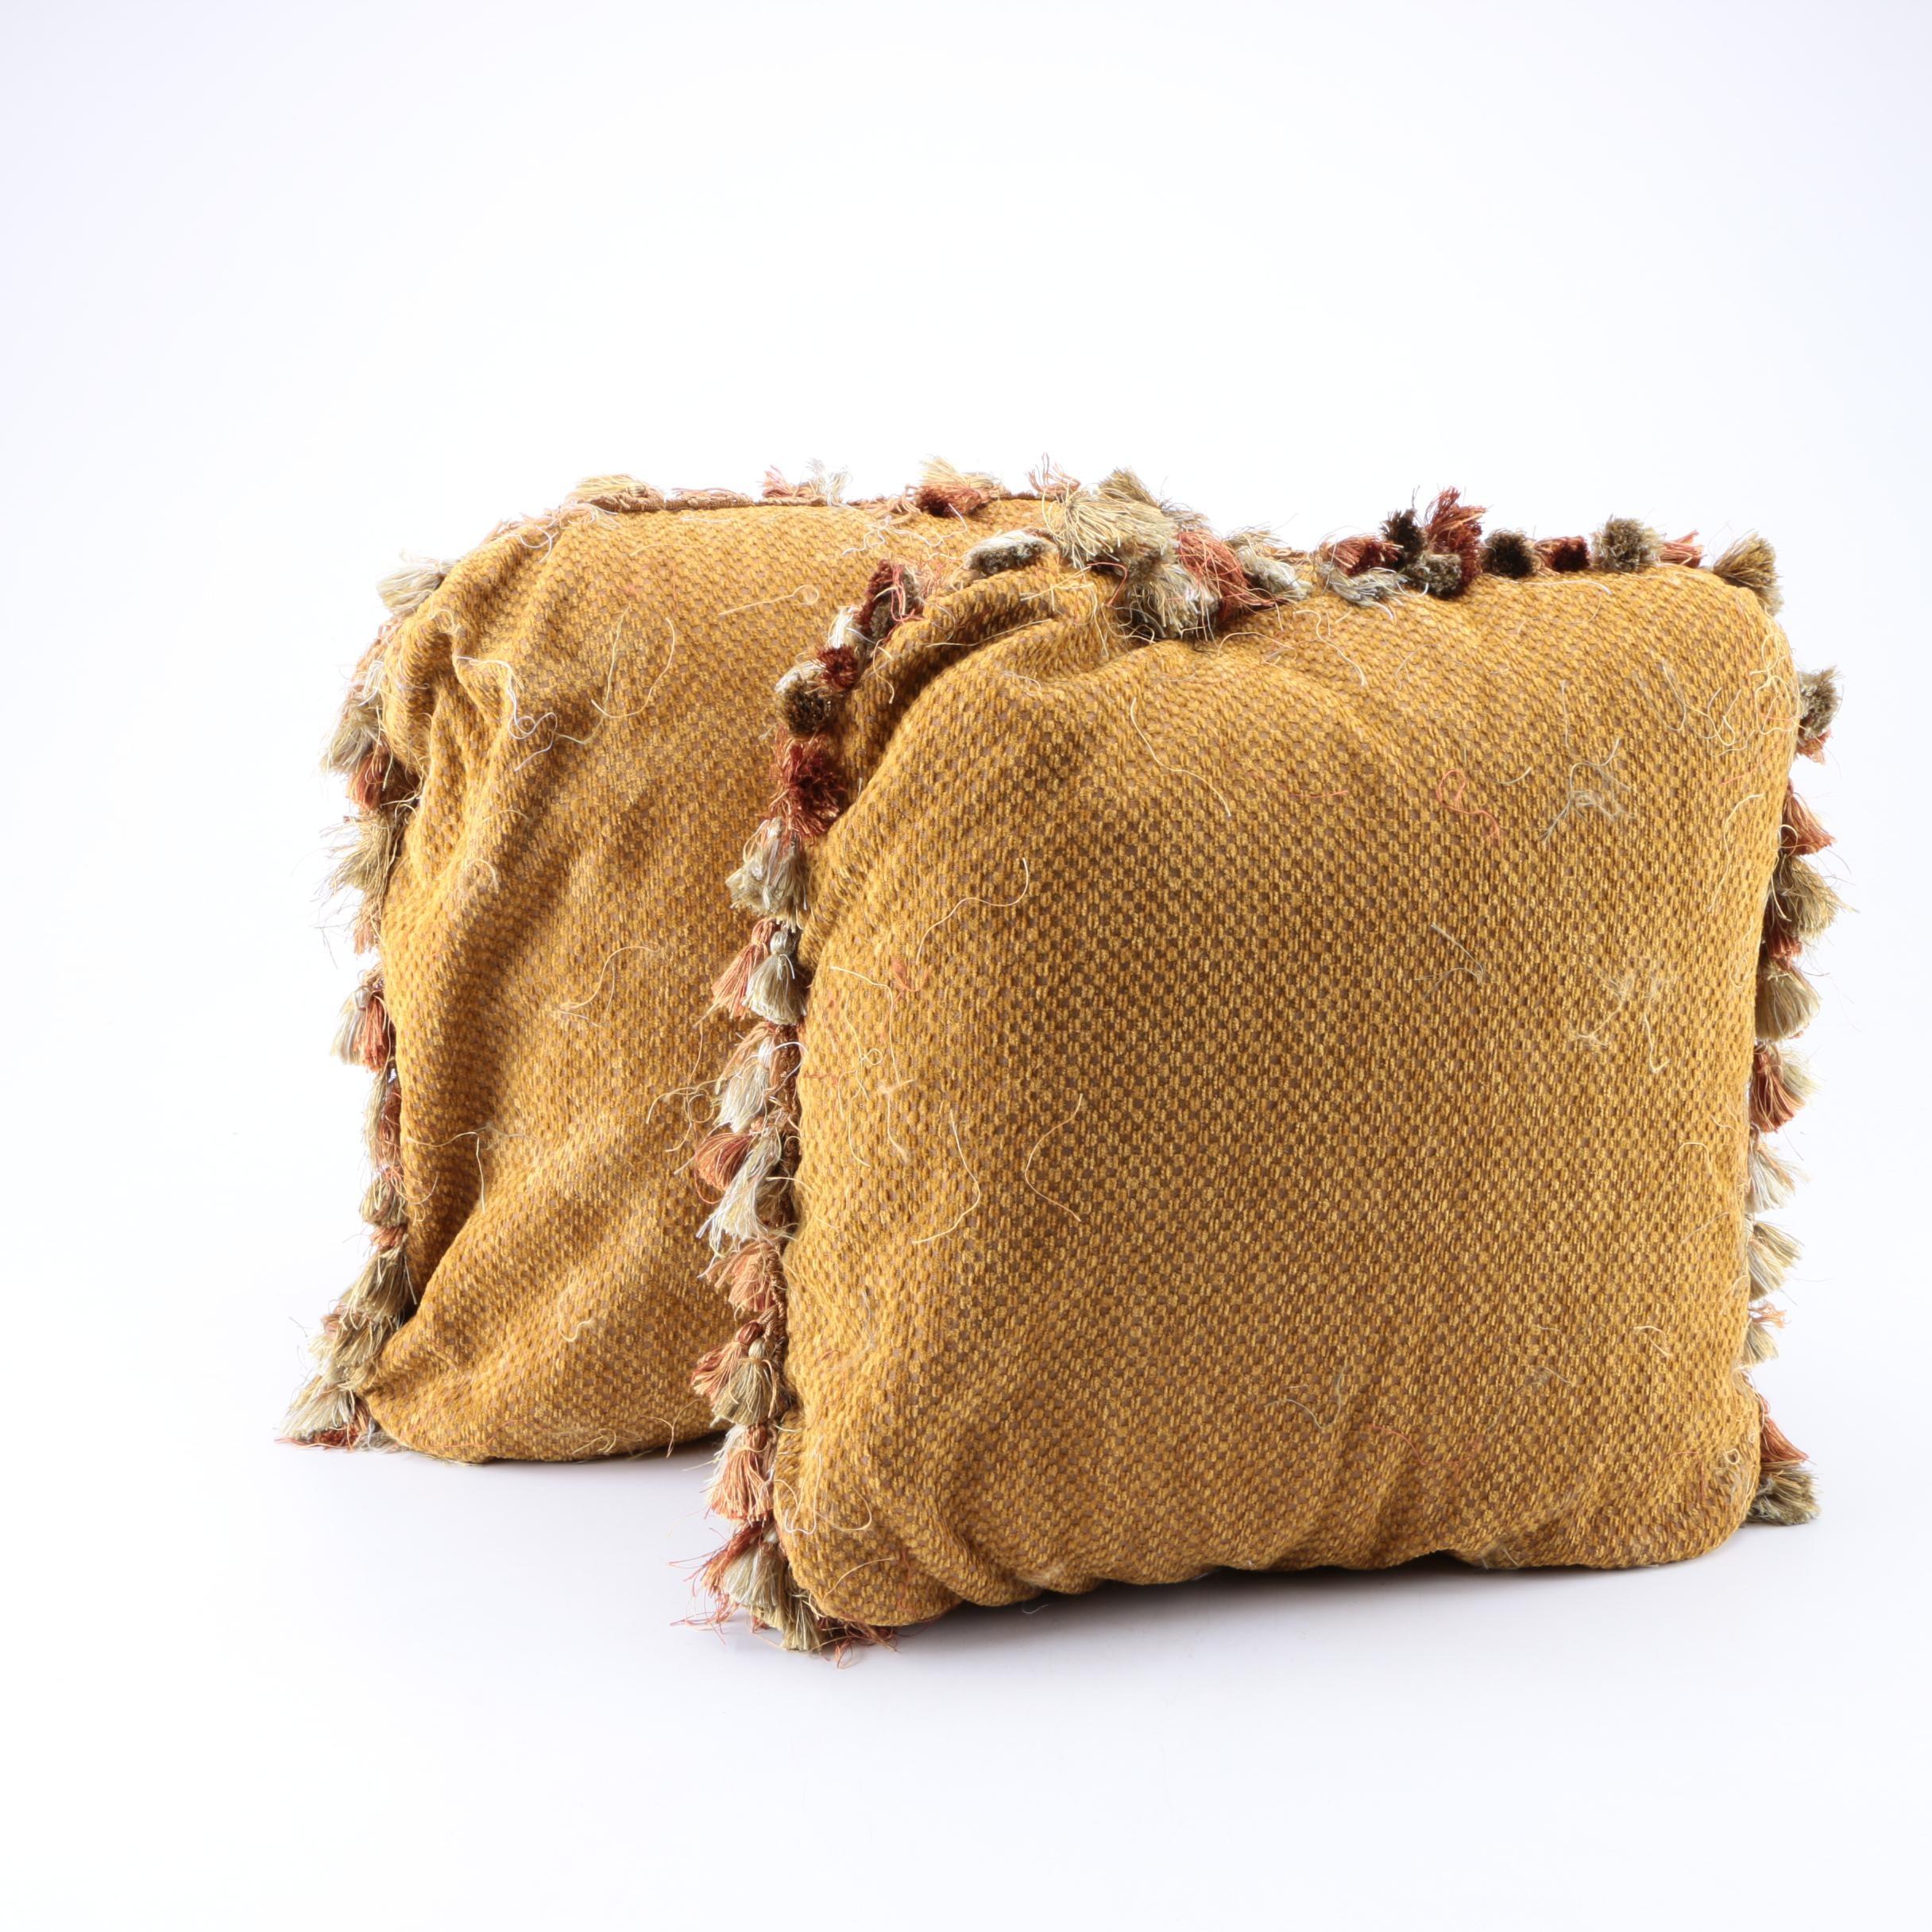 Pair of Matching Throw Pillows